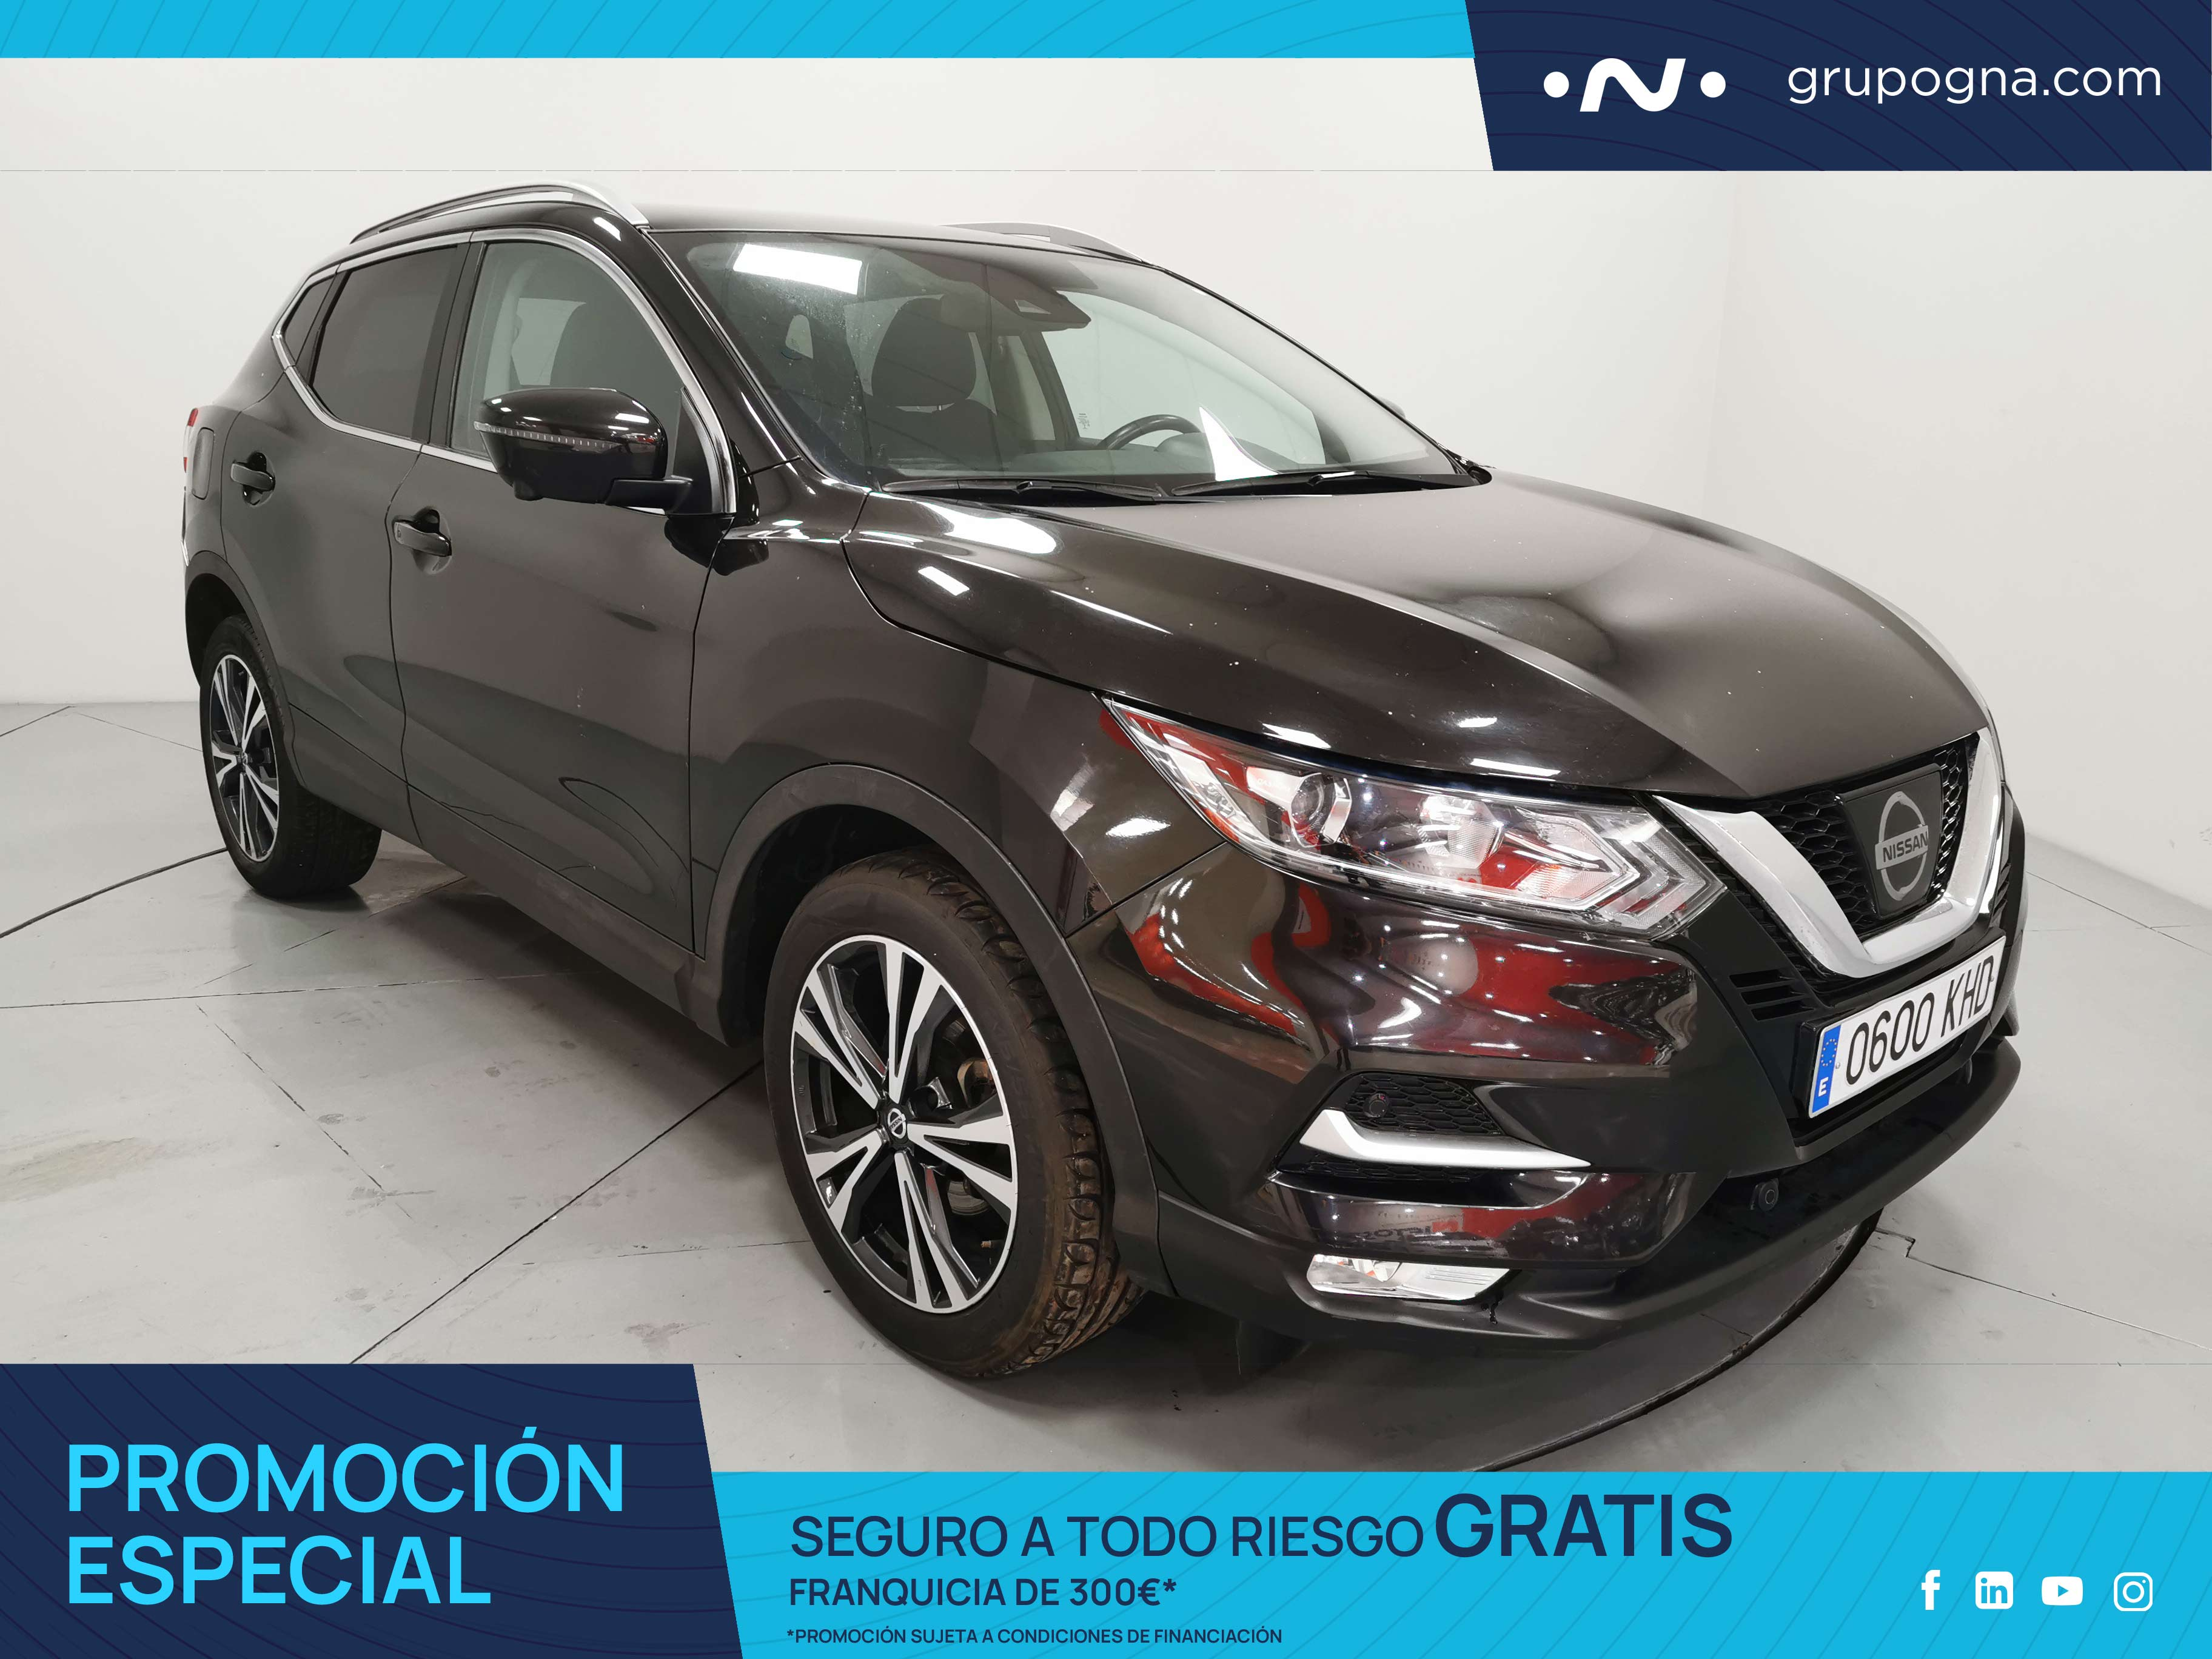 Nissan Qashqai ocasión segunda mano 2018 Gasolina por 16.600€ en Málaga